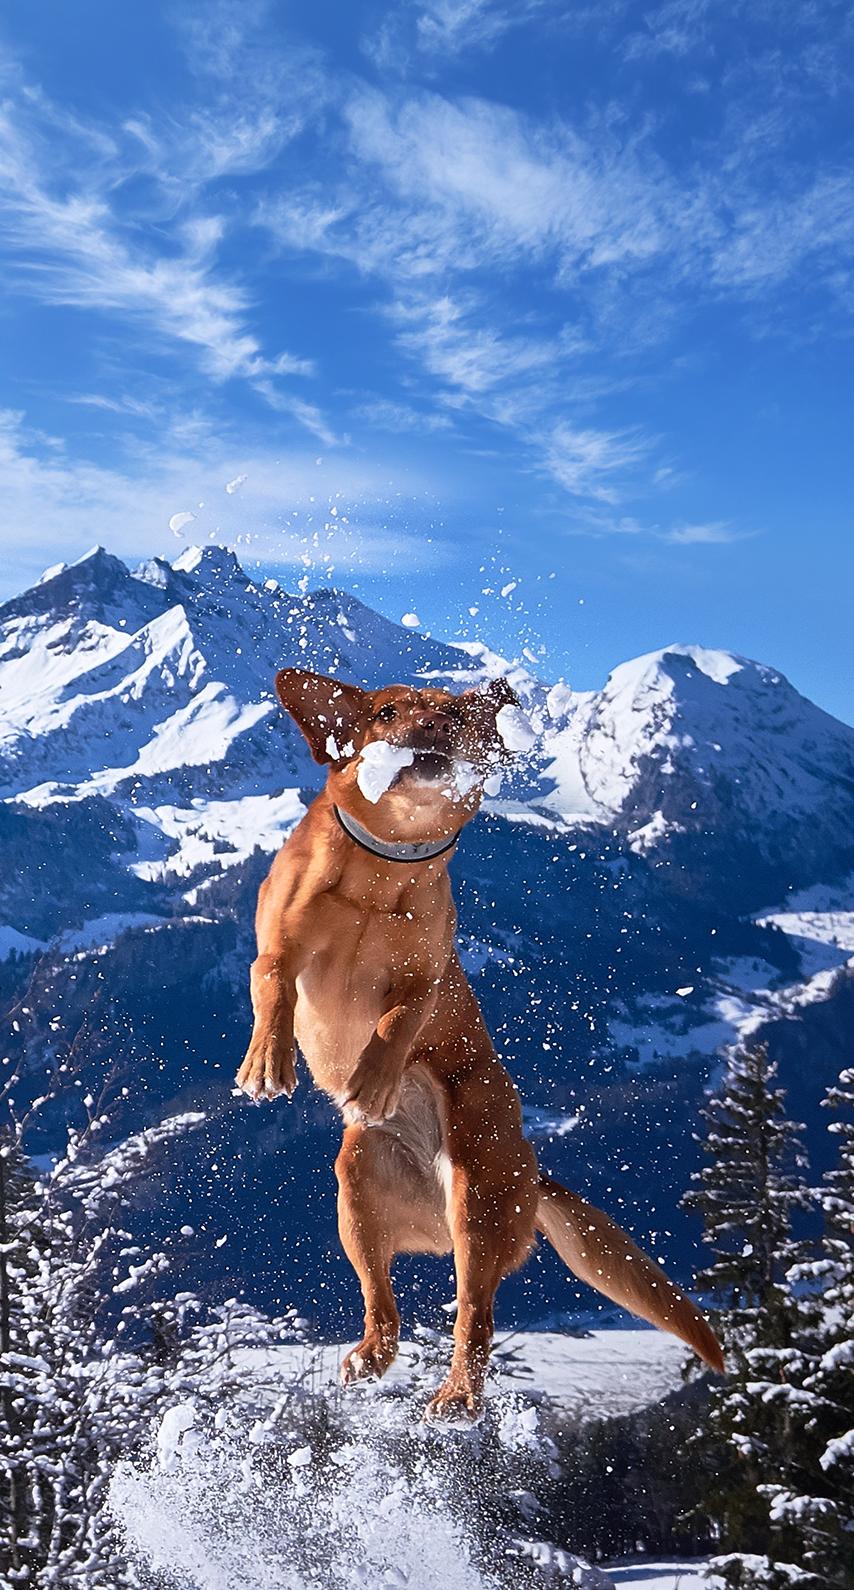 mountaineering, winter sport